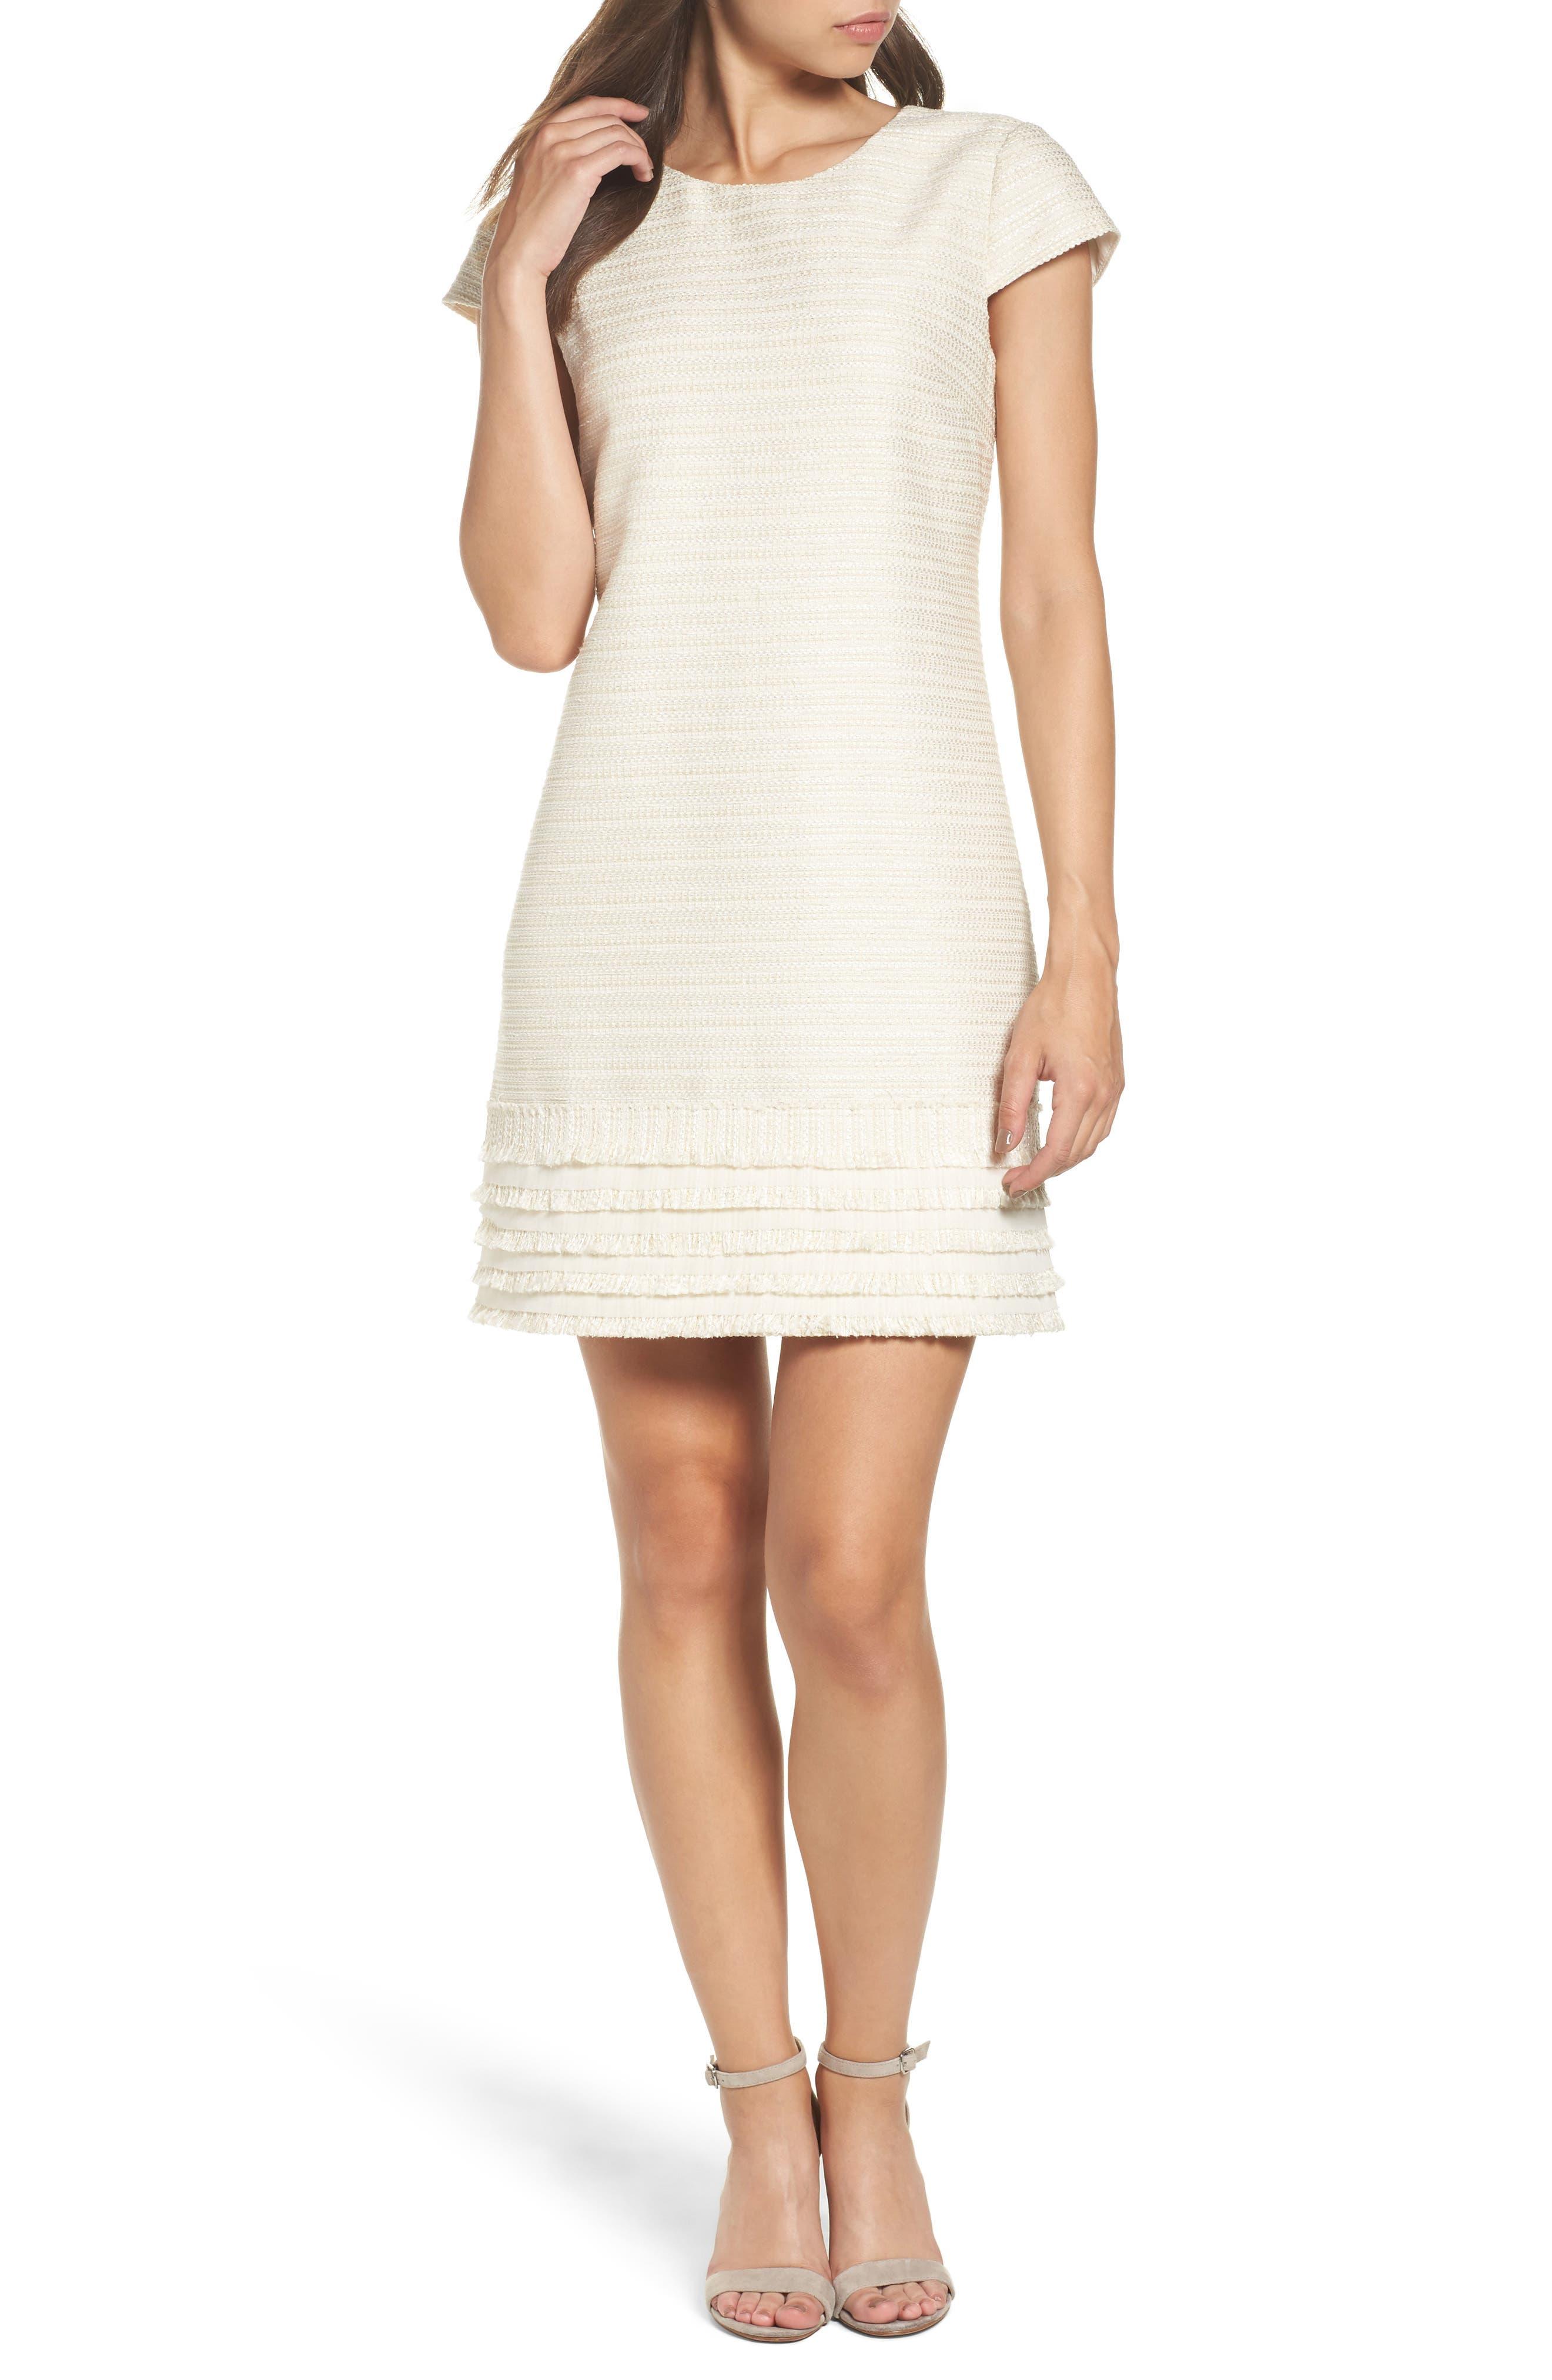 Alternate Image 1 Selected - Vince Camuto Fringed Tweed Shift Dress (Regular & Petite)